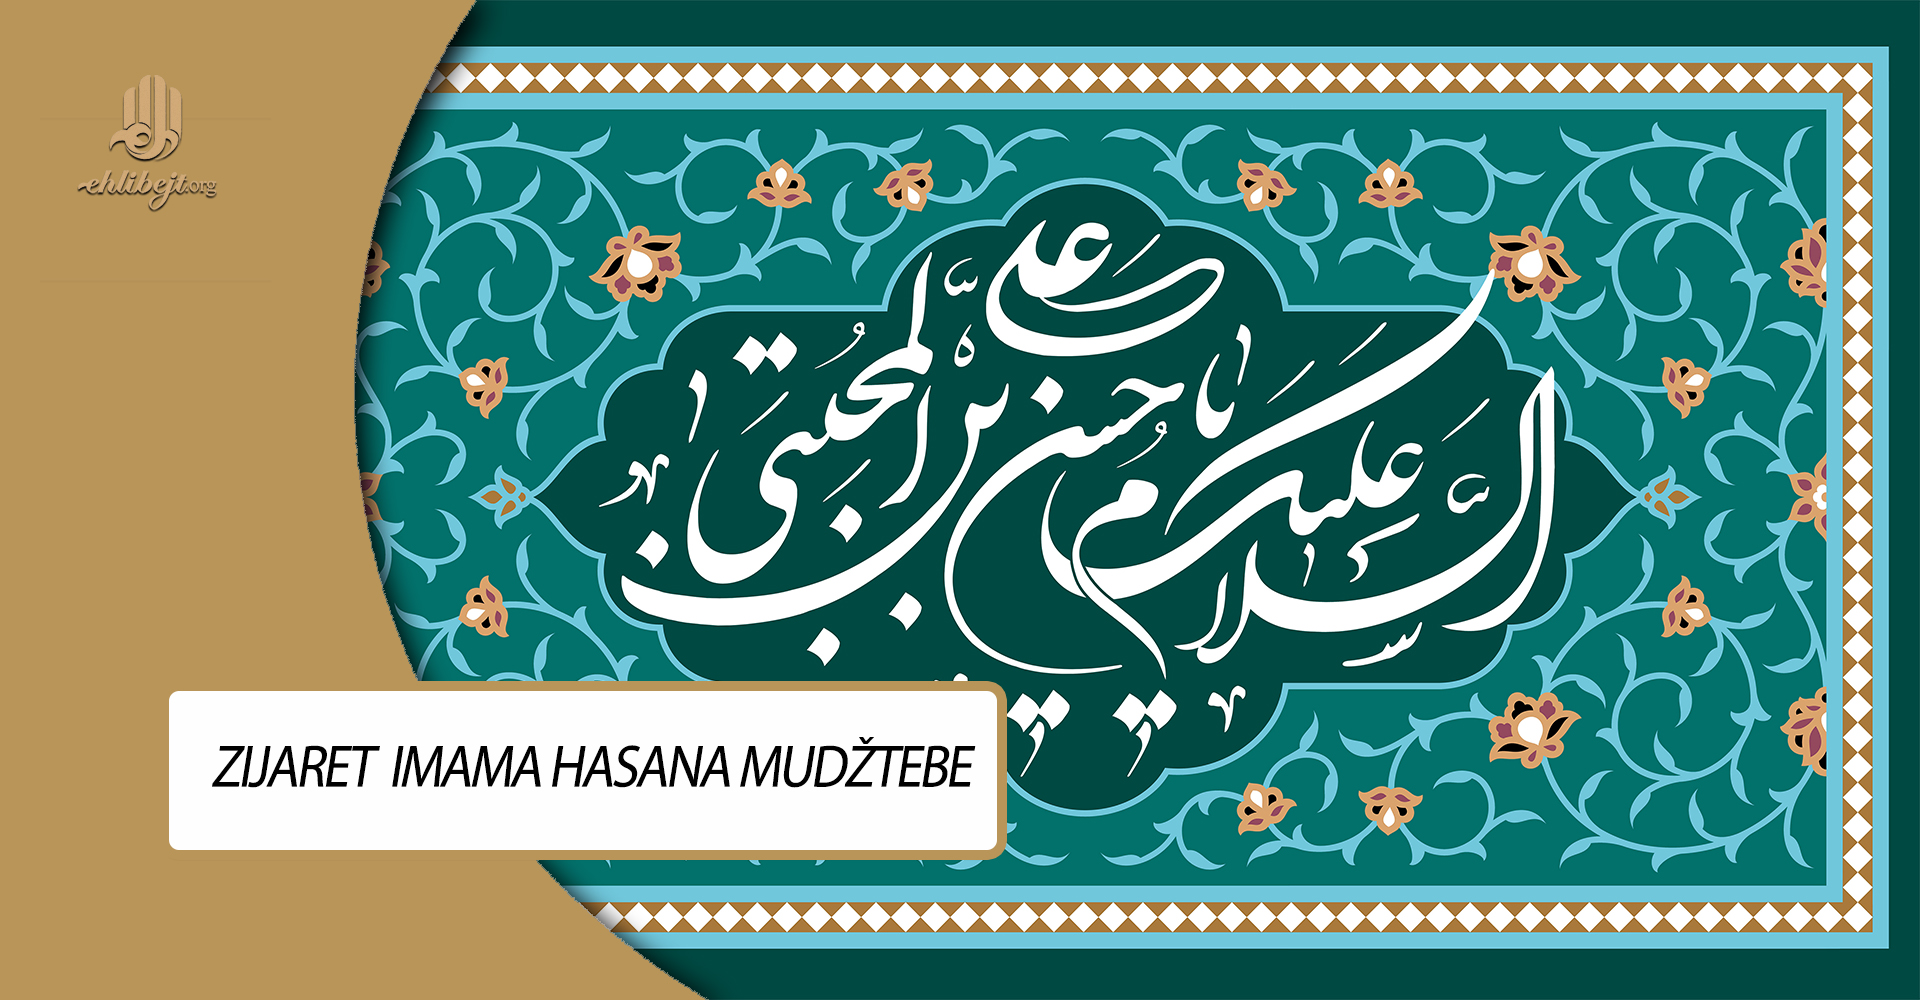 Zijaret Imama Hasana Mudžtebe, a.s.